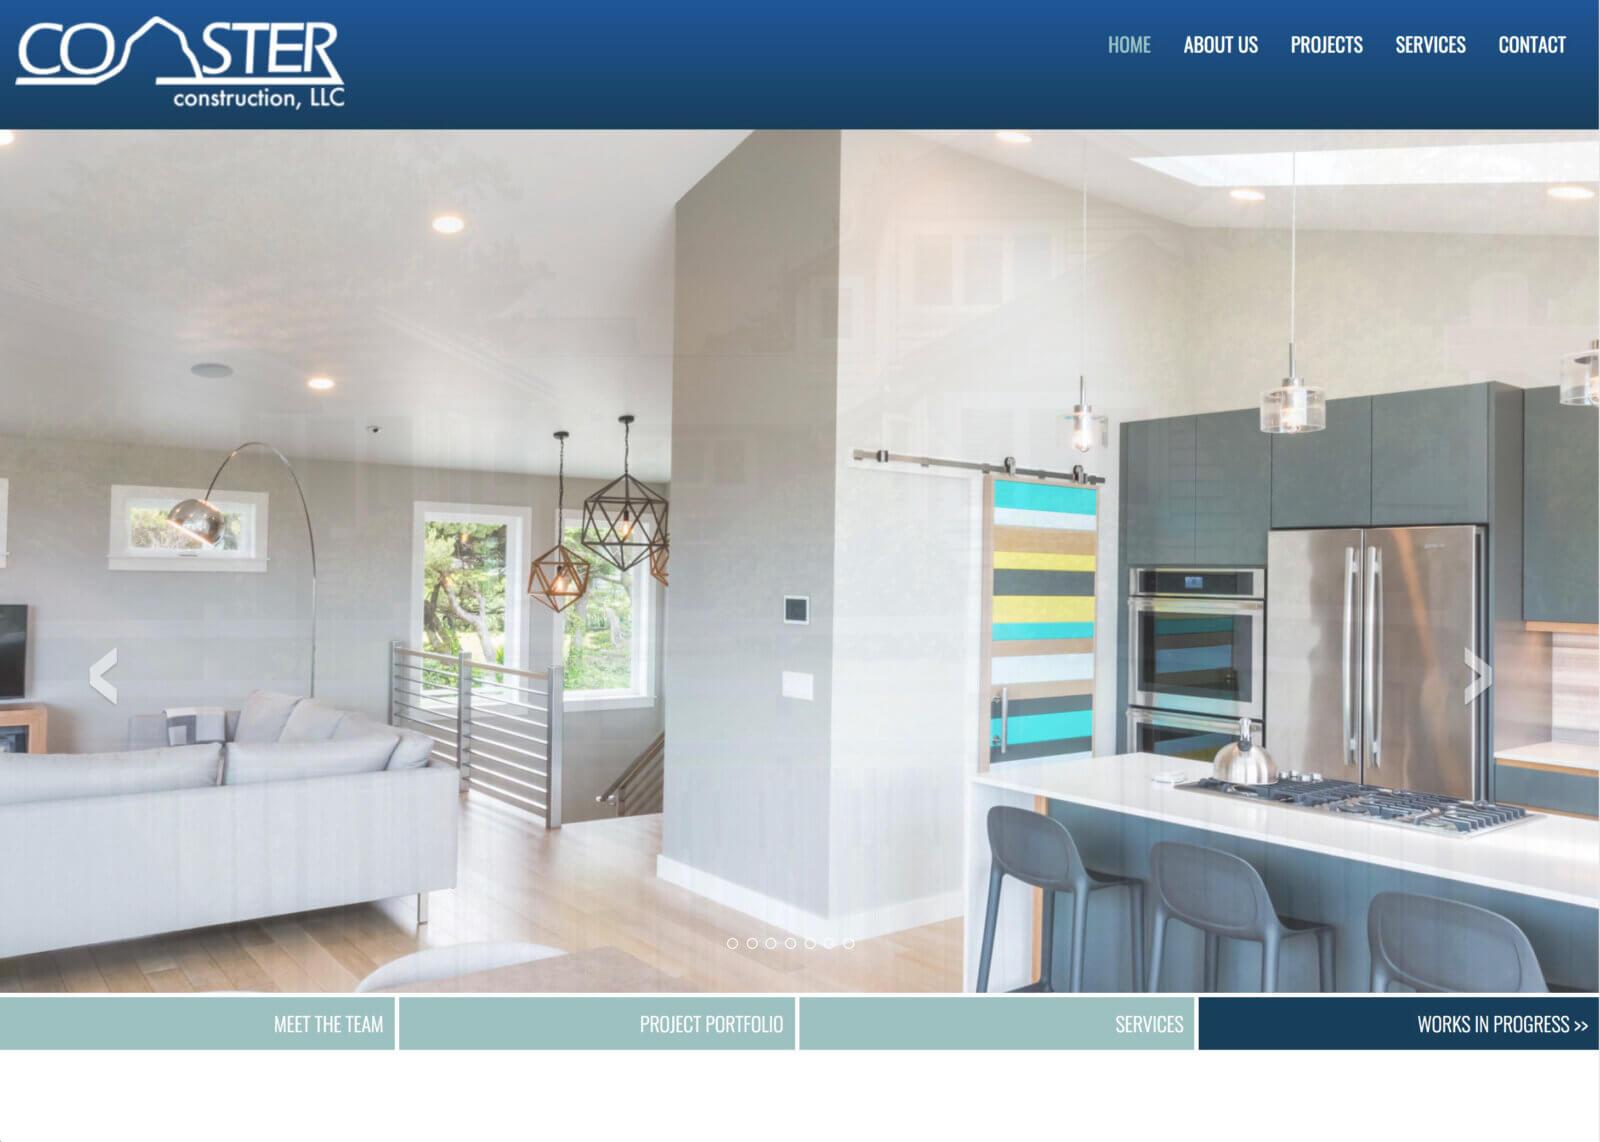 Coaster construction website